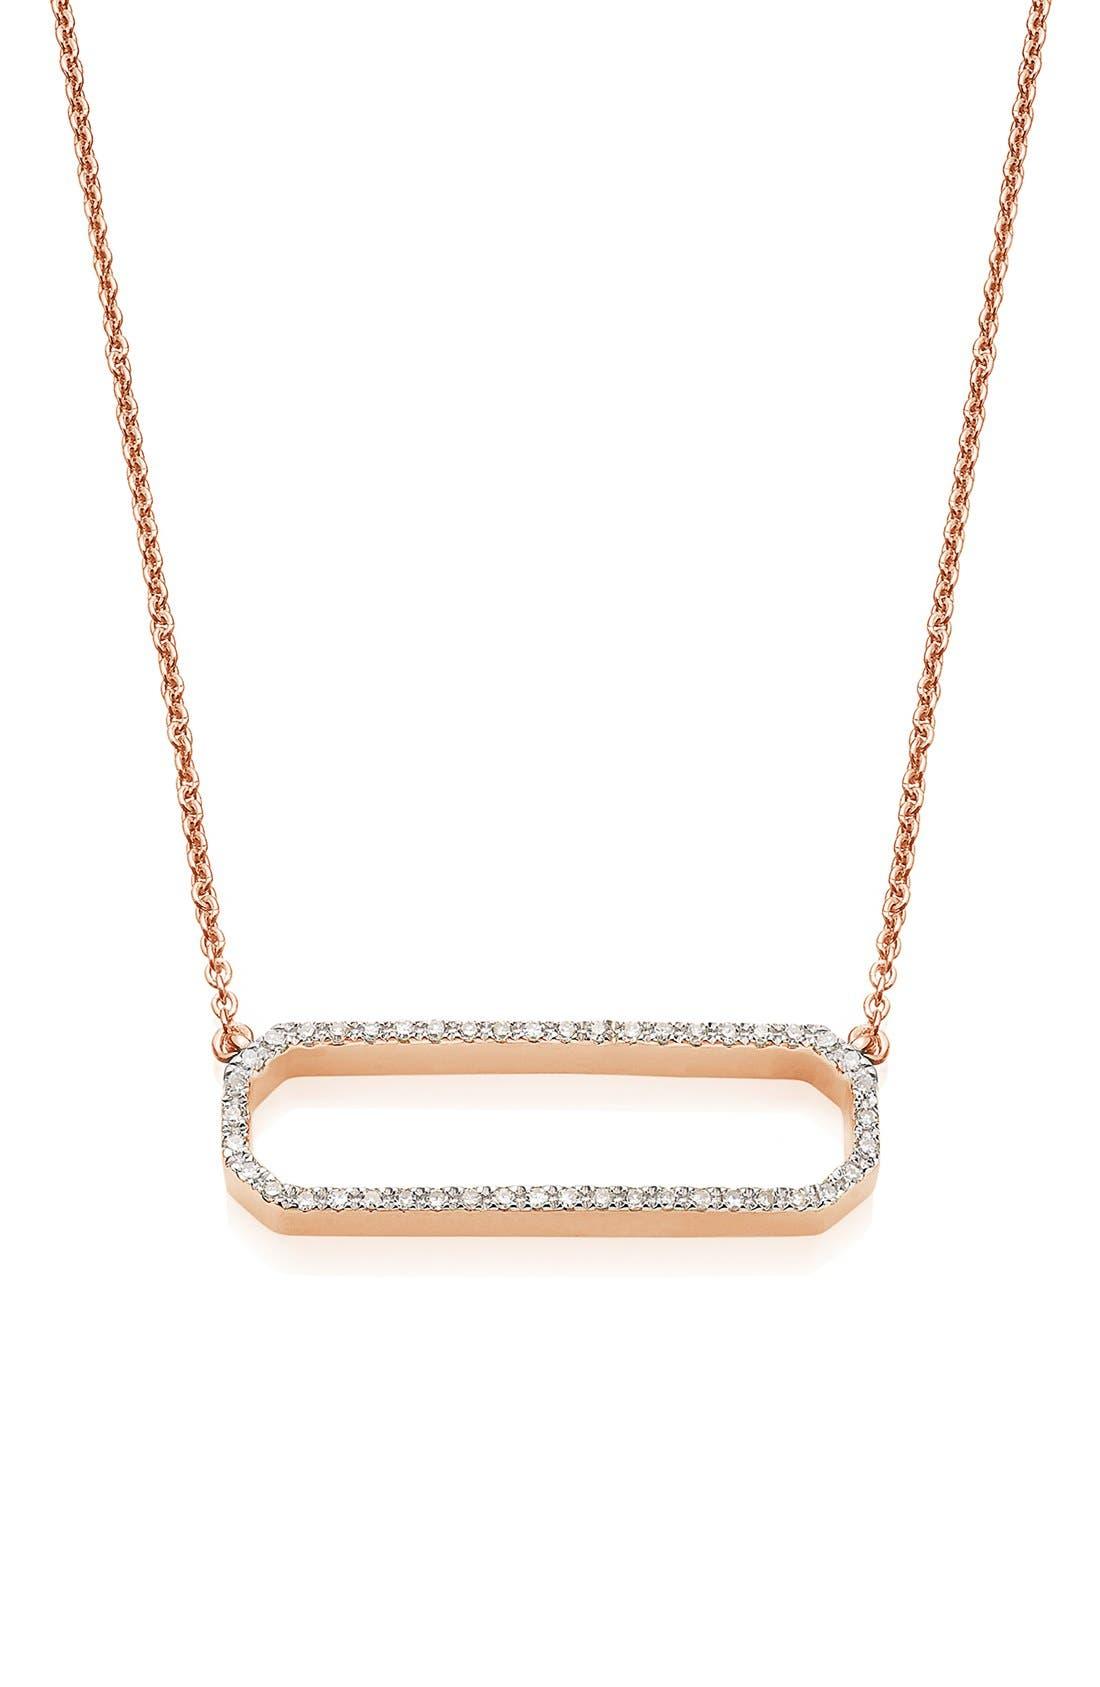 Alternate Image 1 Selected - Monica Vinader 'Naida' Open Rectangle Diamond Pendant Necklace